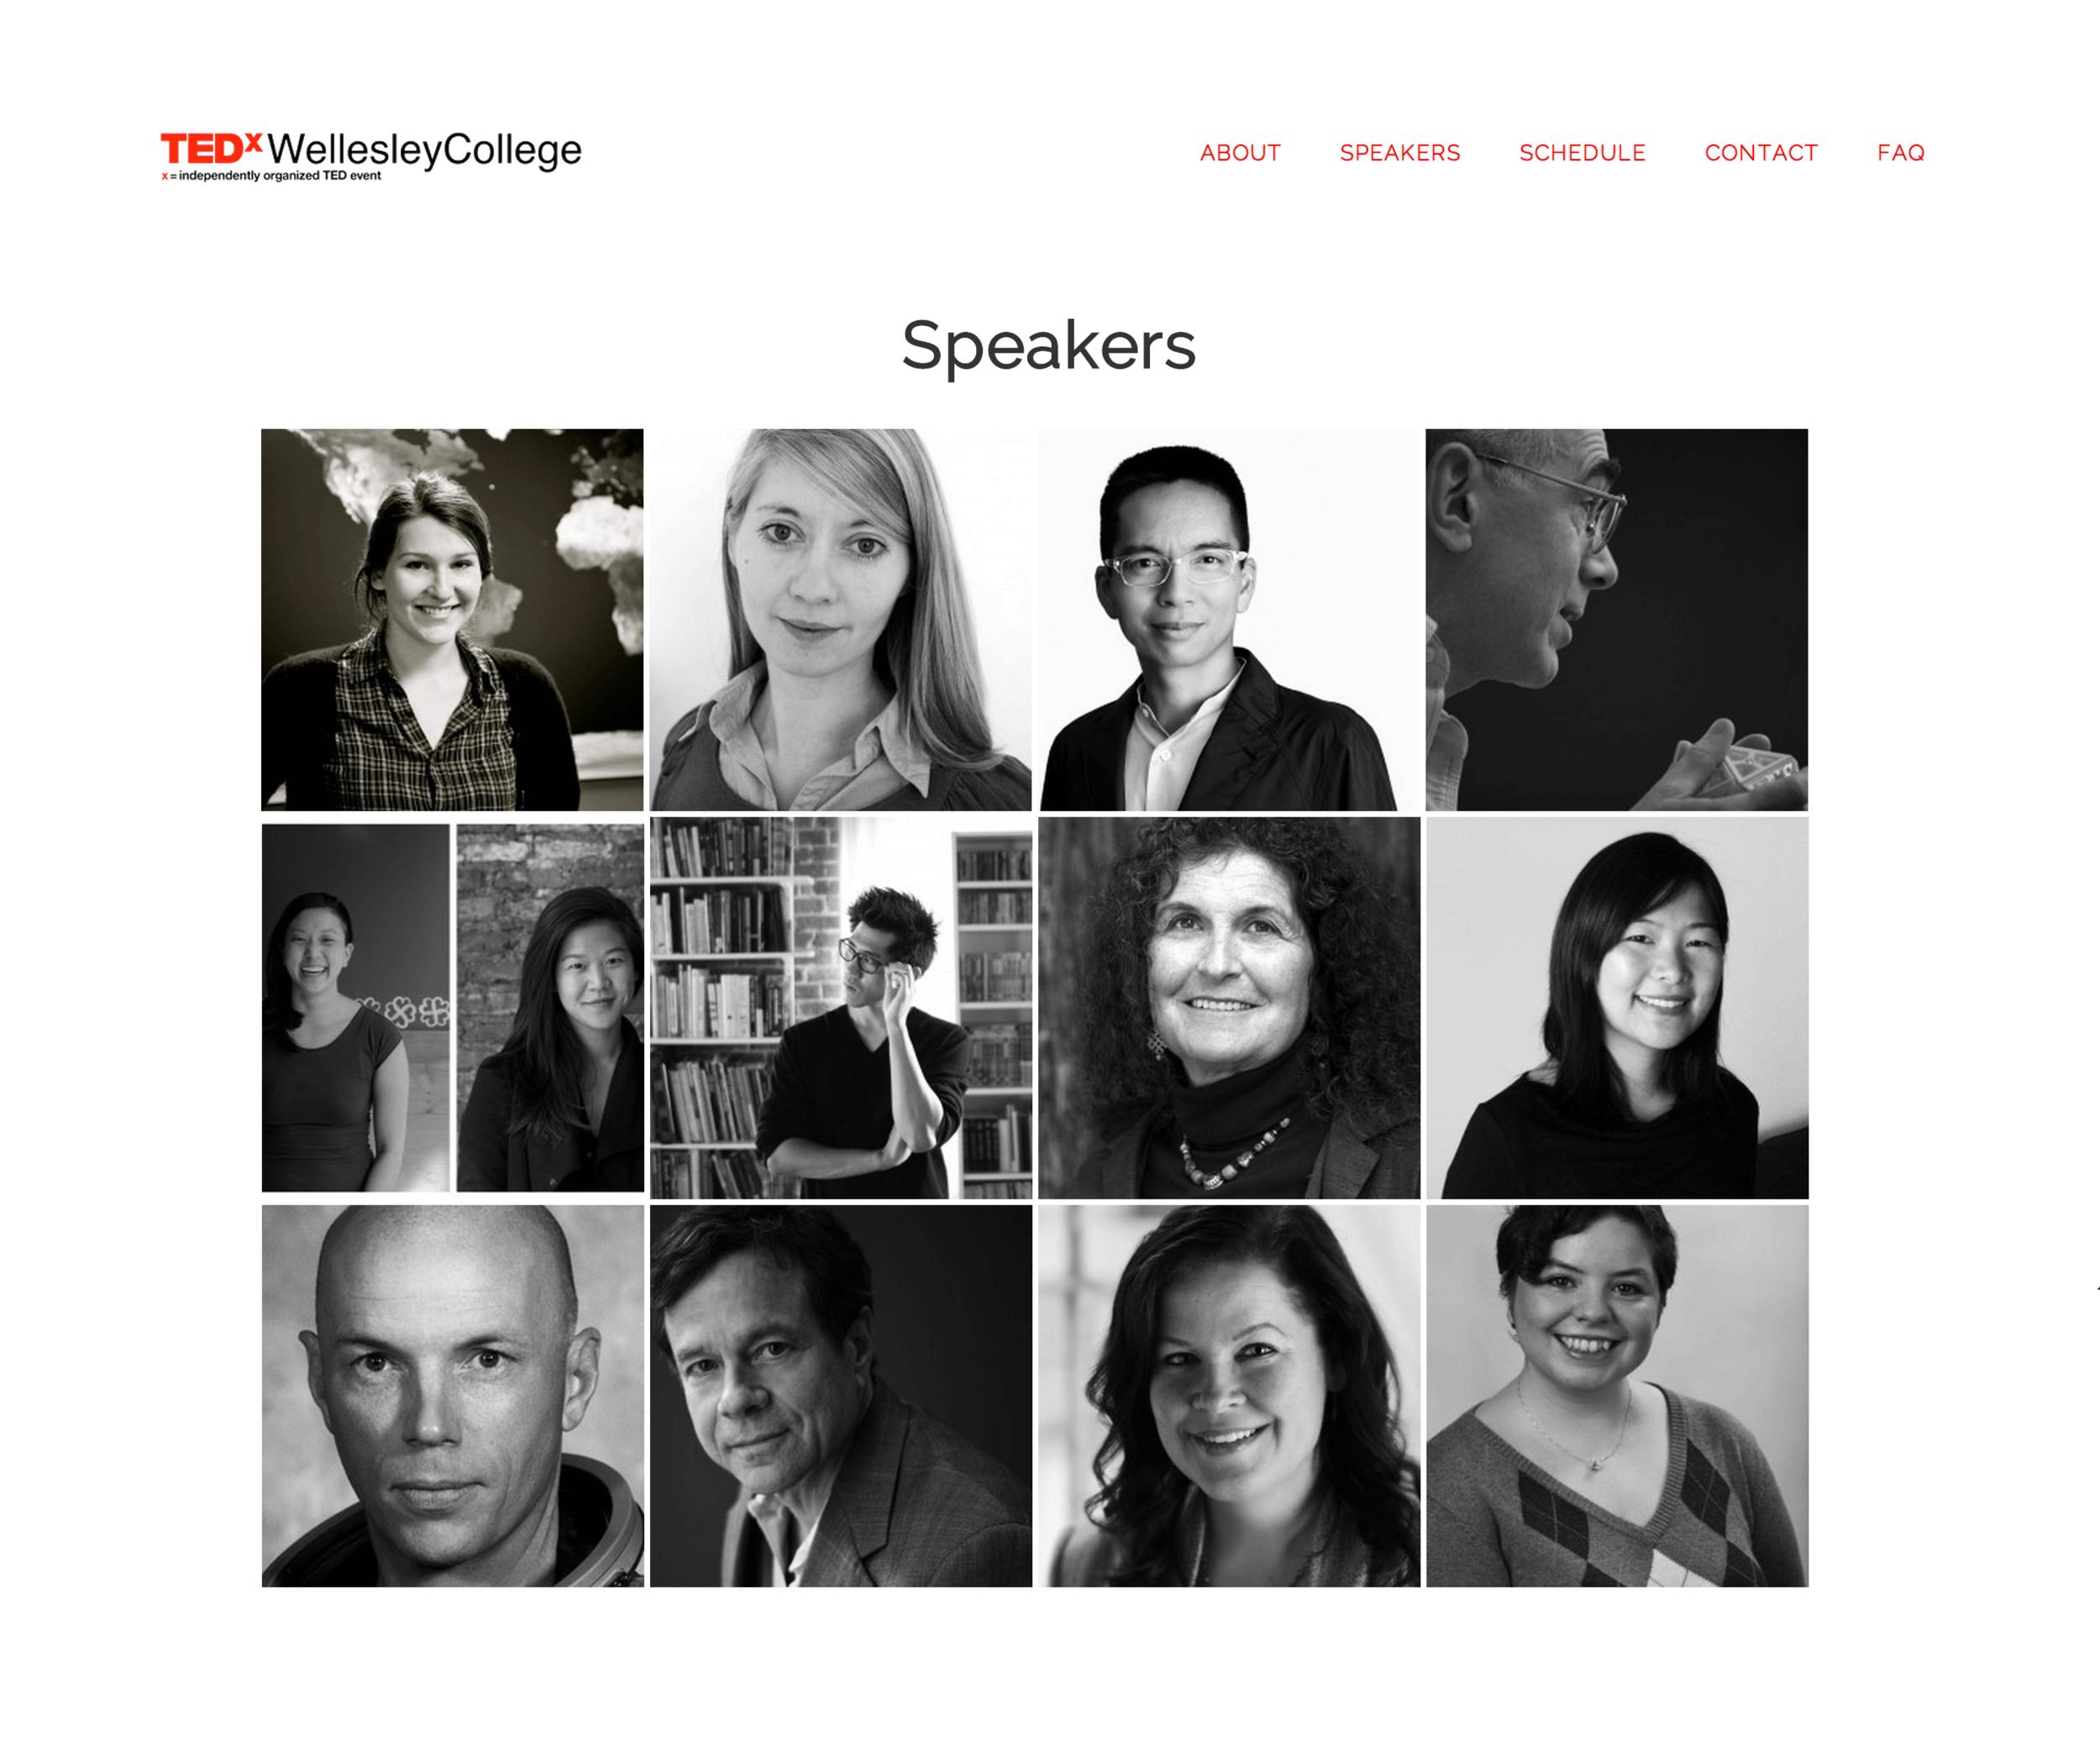 TEDxWebsite_0006_Speakers.png